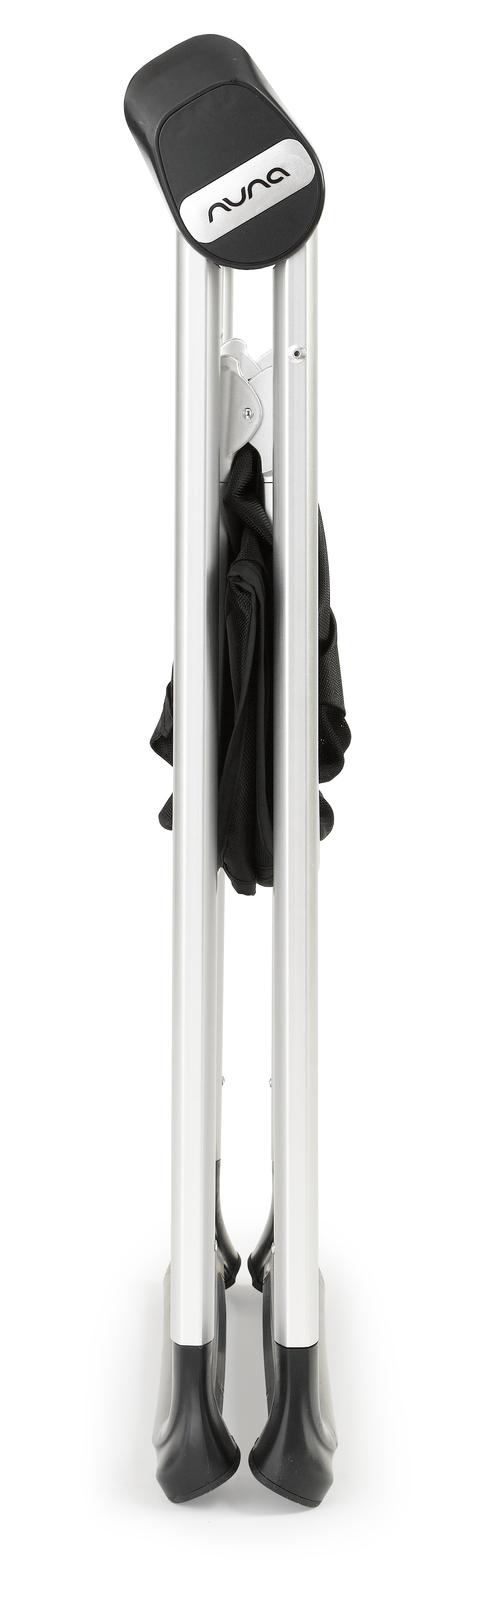 Nuna Ivvi Carry Cot Stand Accessory image